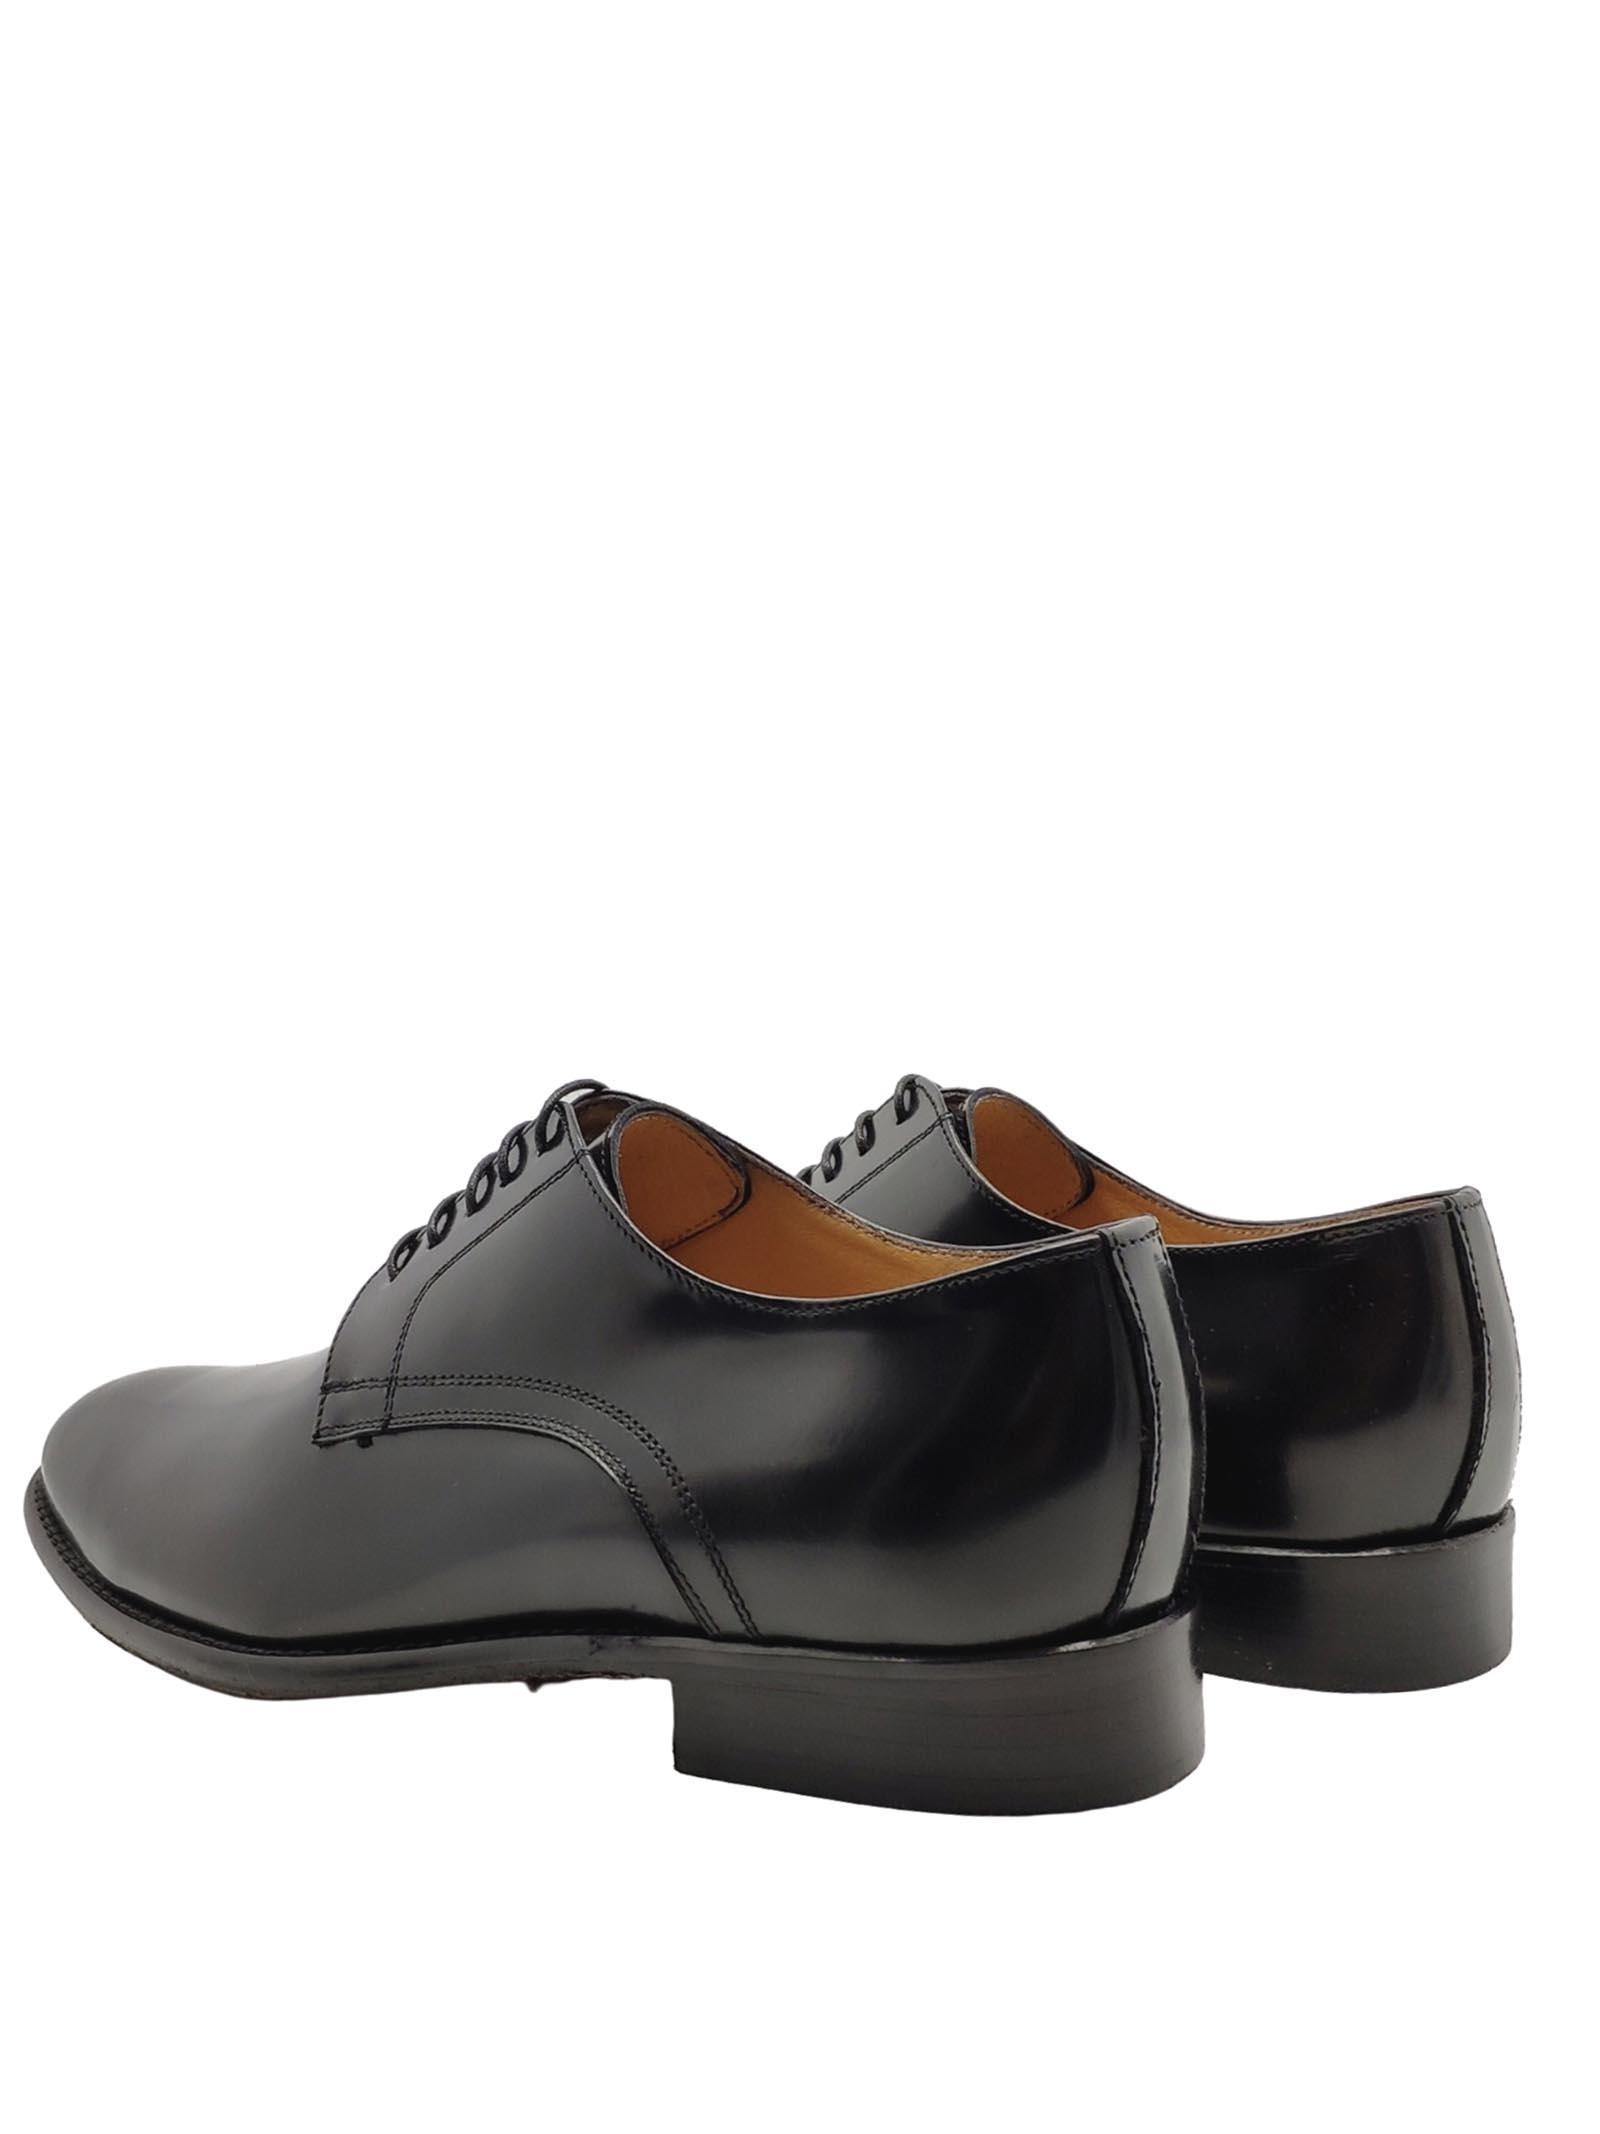 Spatarella | Lace up shoes | 02200NERO